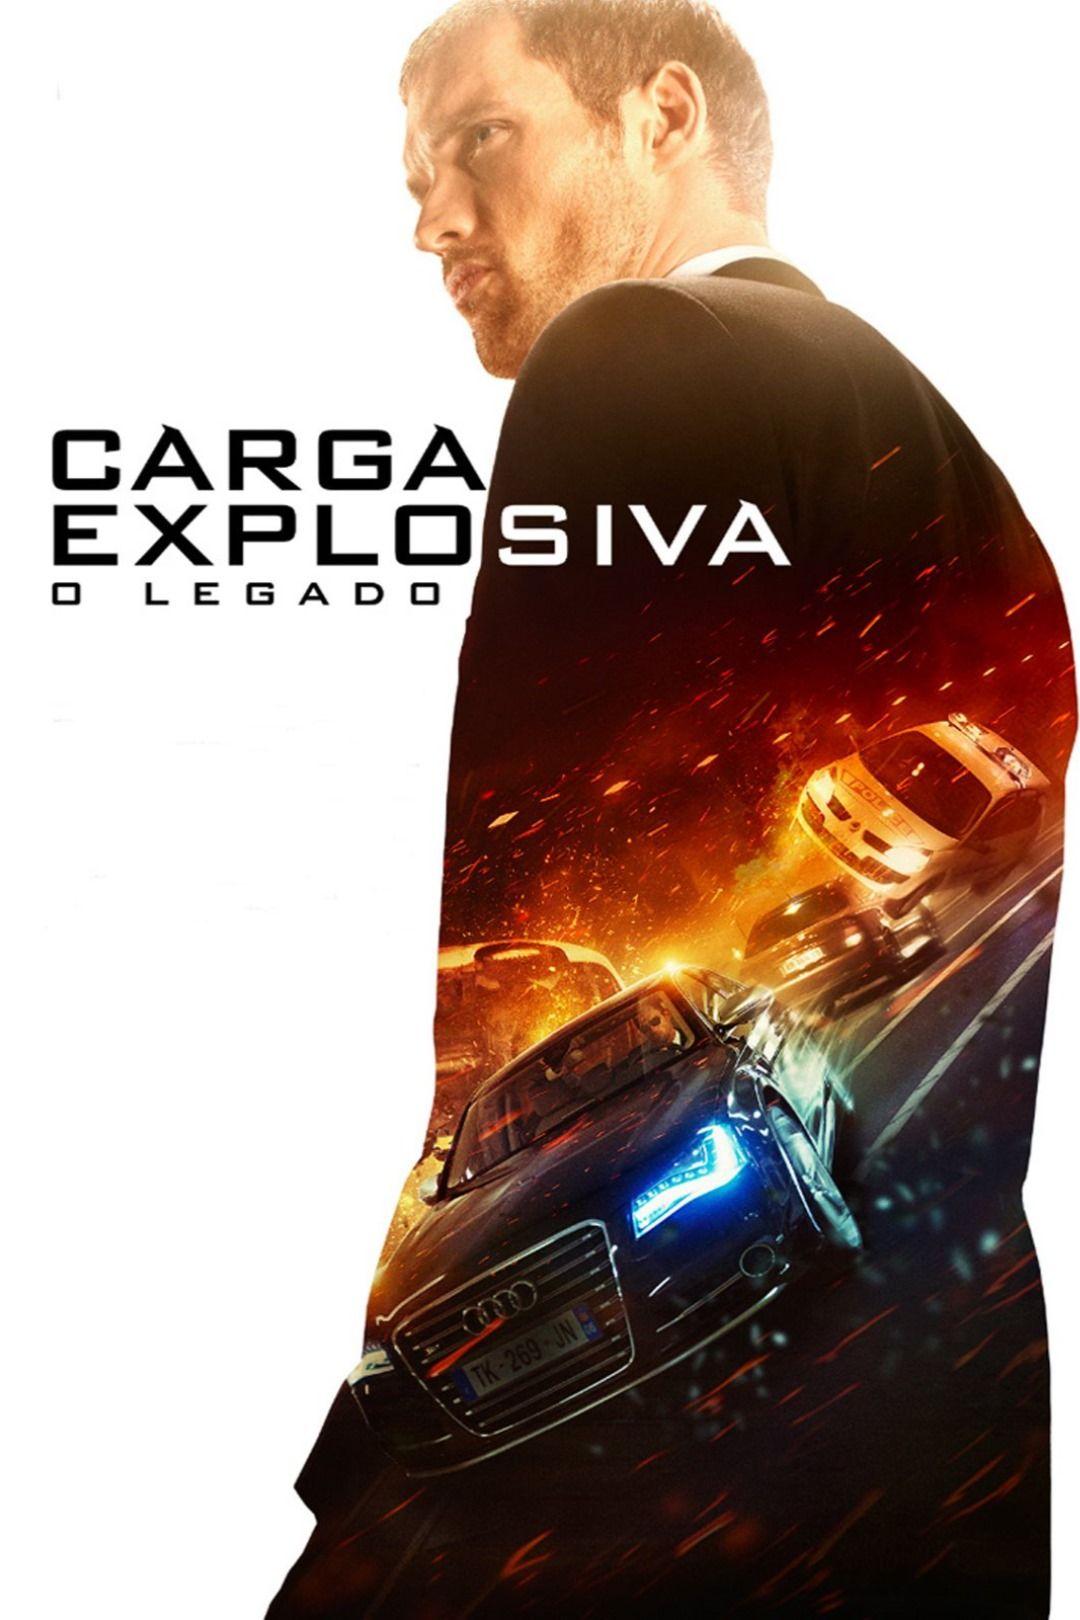 Carga Explosiva O Legado Carga Explosiva Filmes On Line Filmes Completos